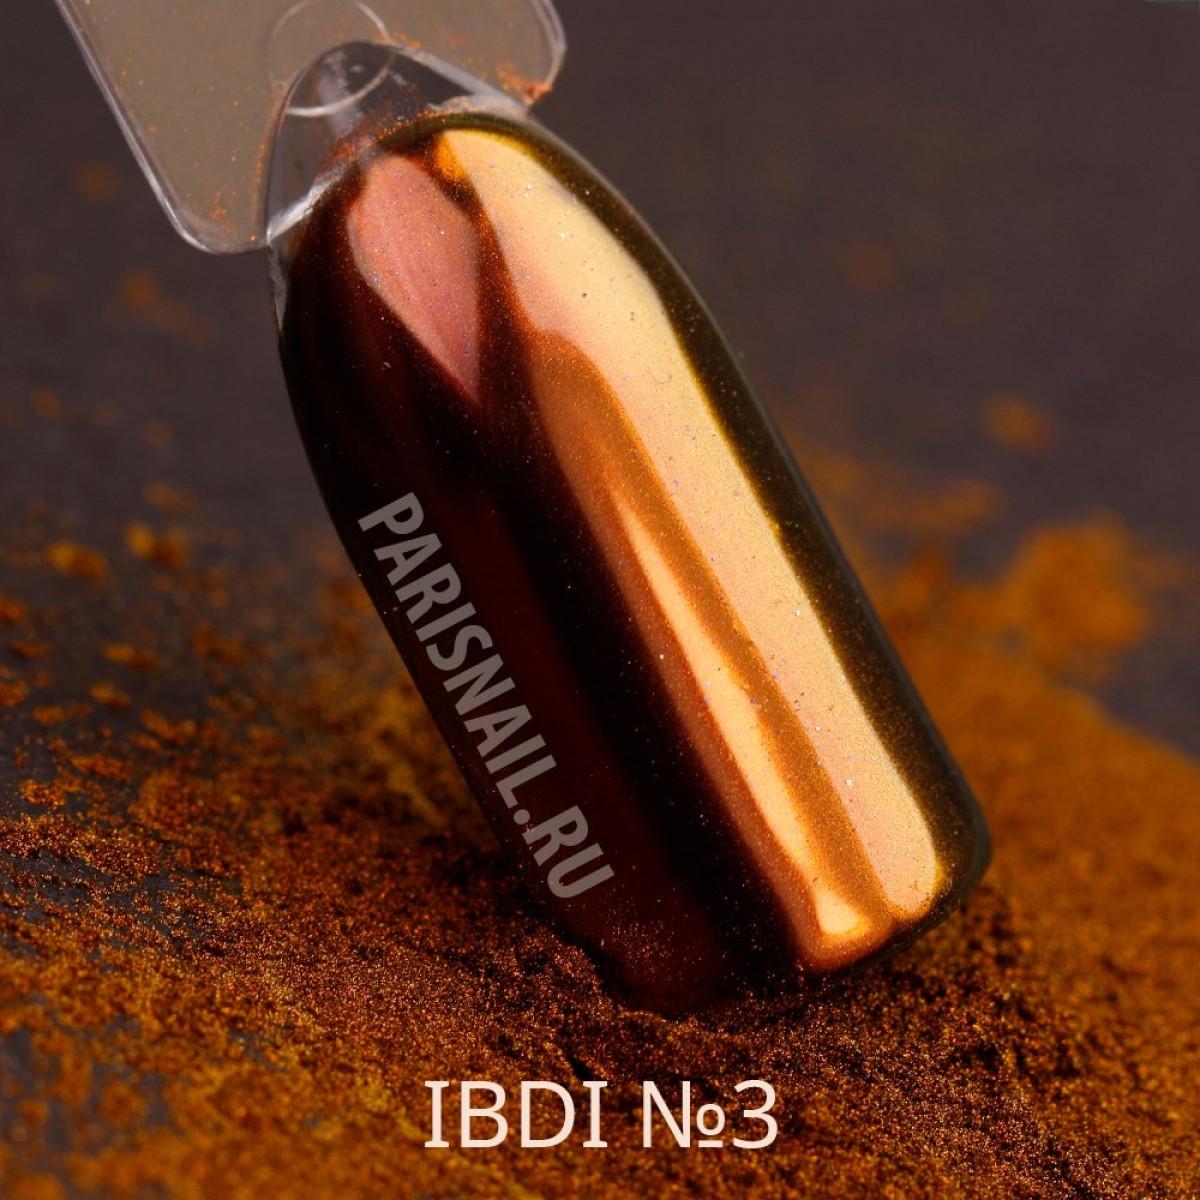 Пигмент Майский жук (Lux3) 0.5 гр